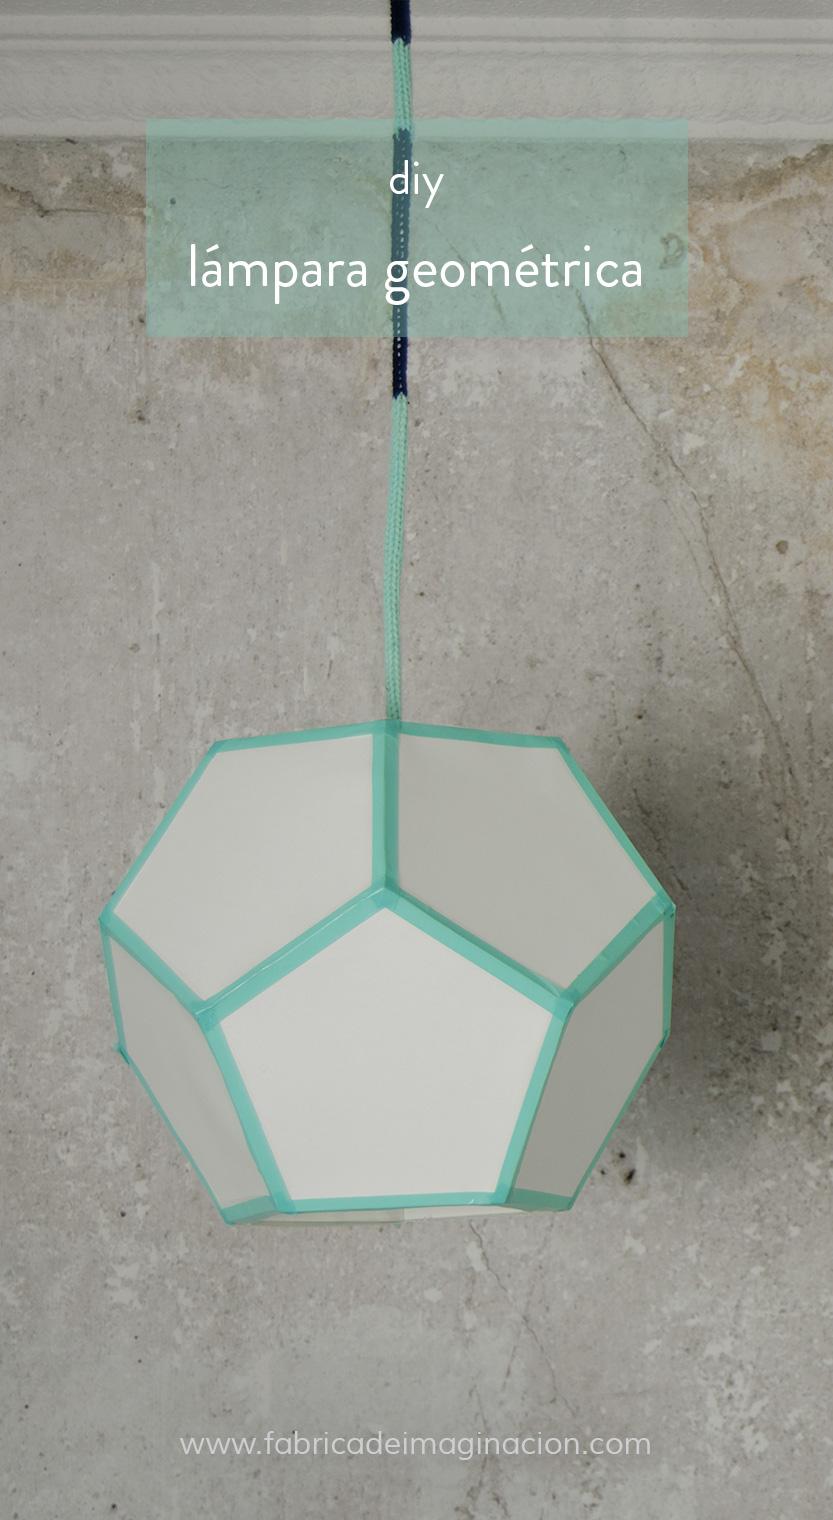 diy-lampara-geometrica-papel06